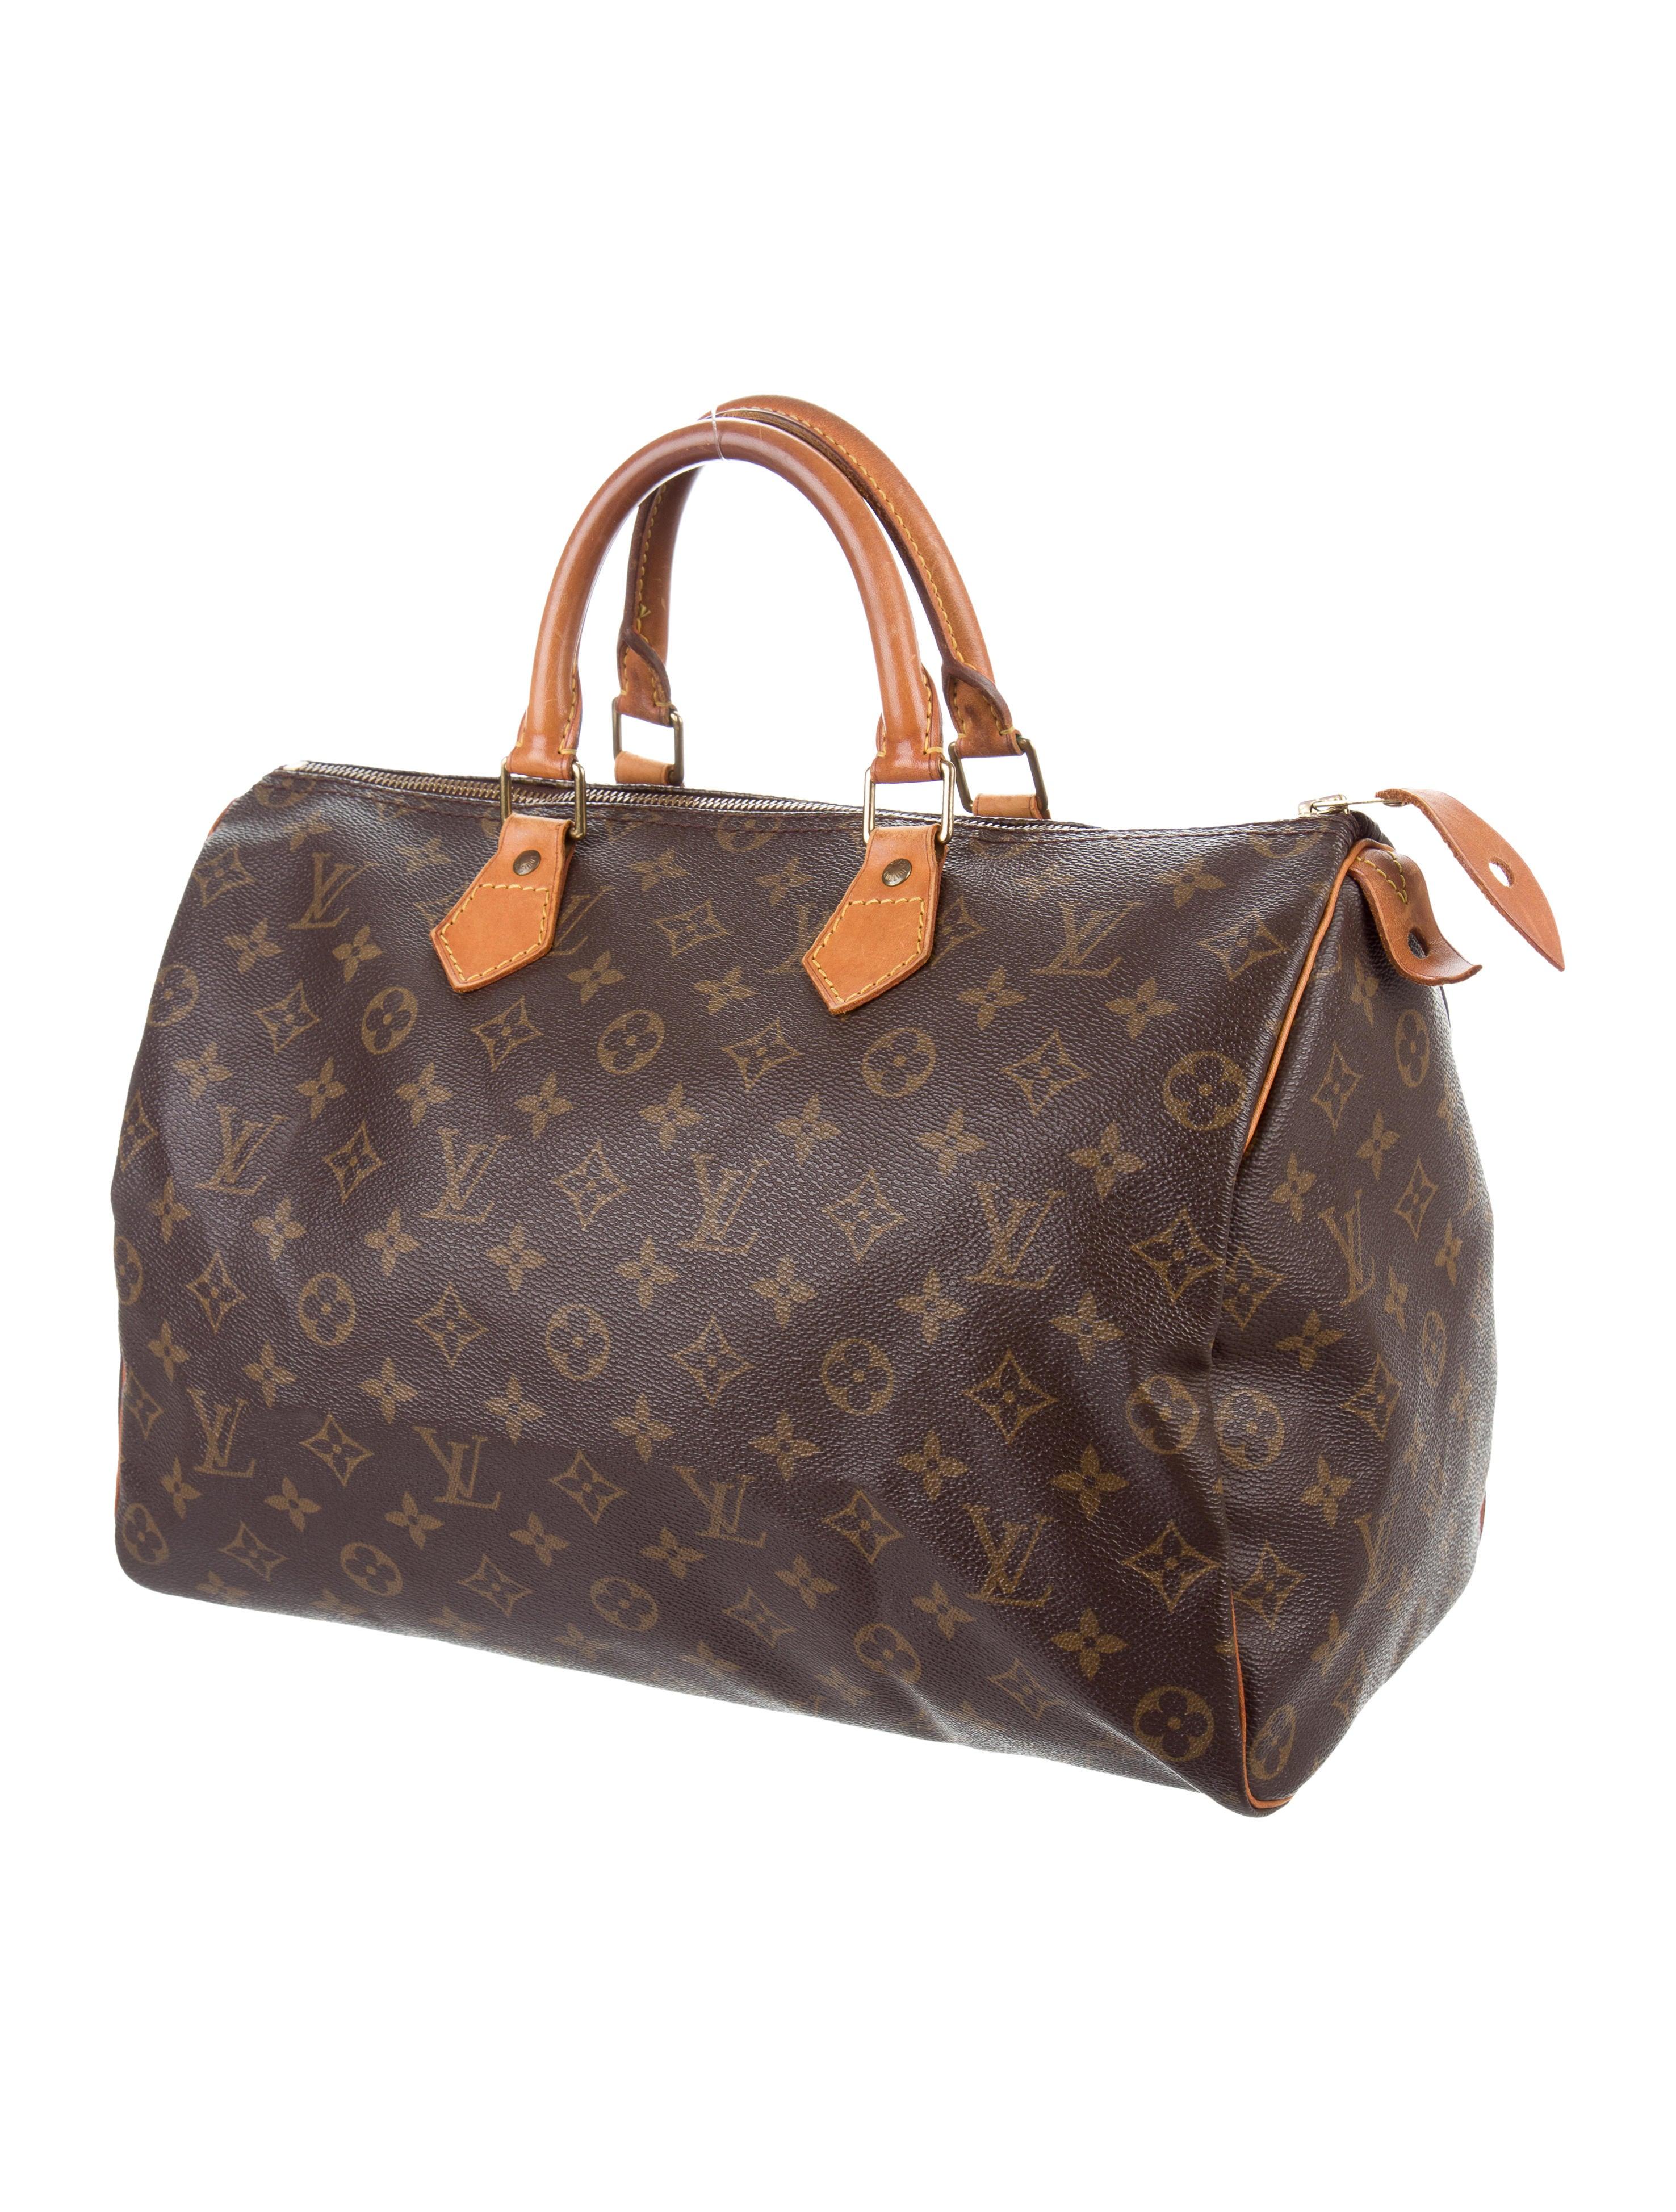 Louis vuitton monogram speedy 35 handbags lou119110 for Louis vuitton miroir speedy 35